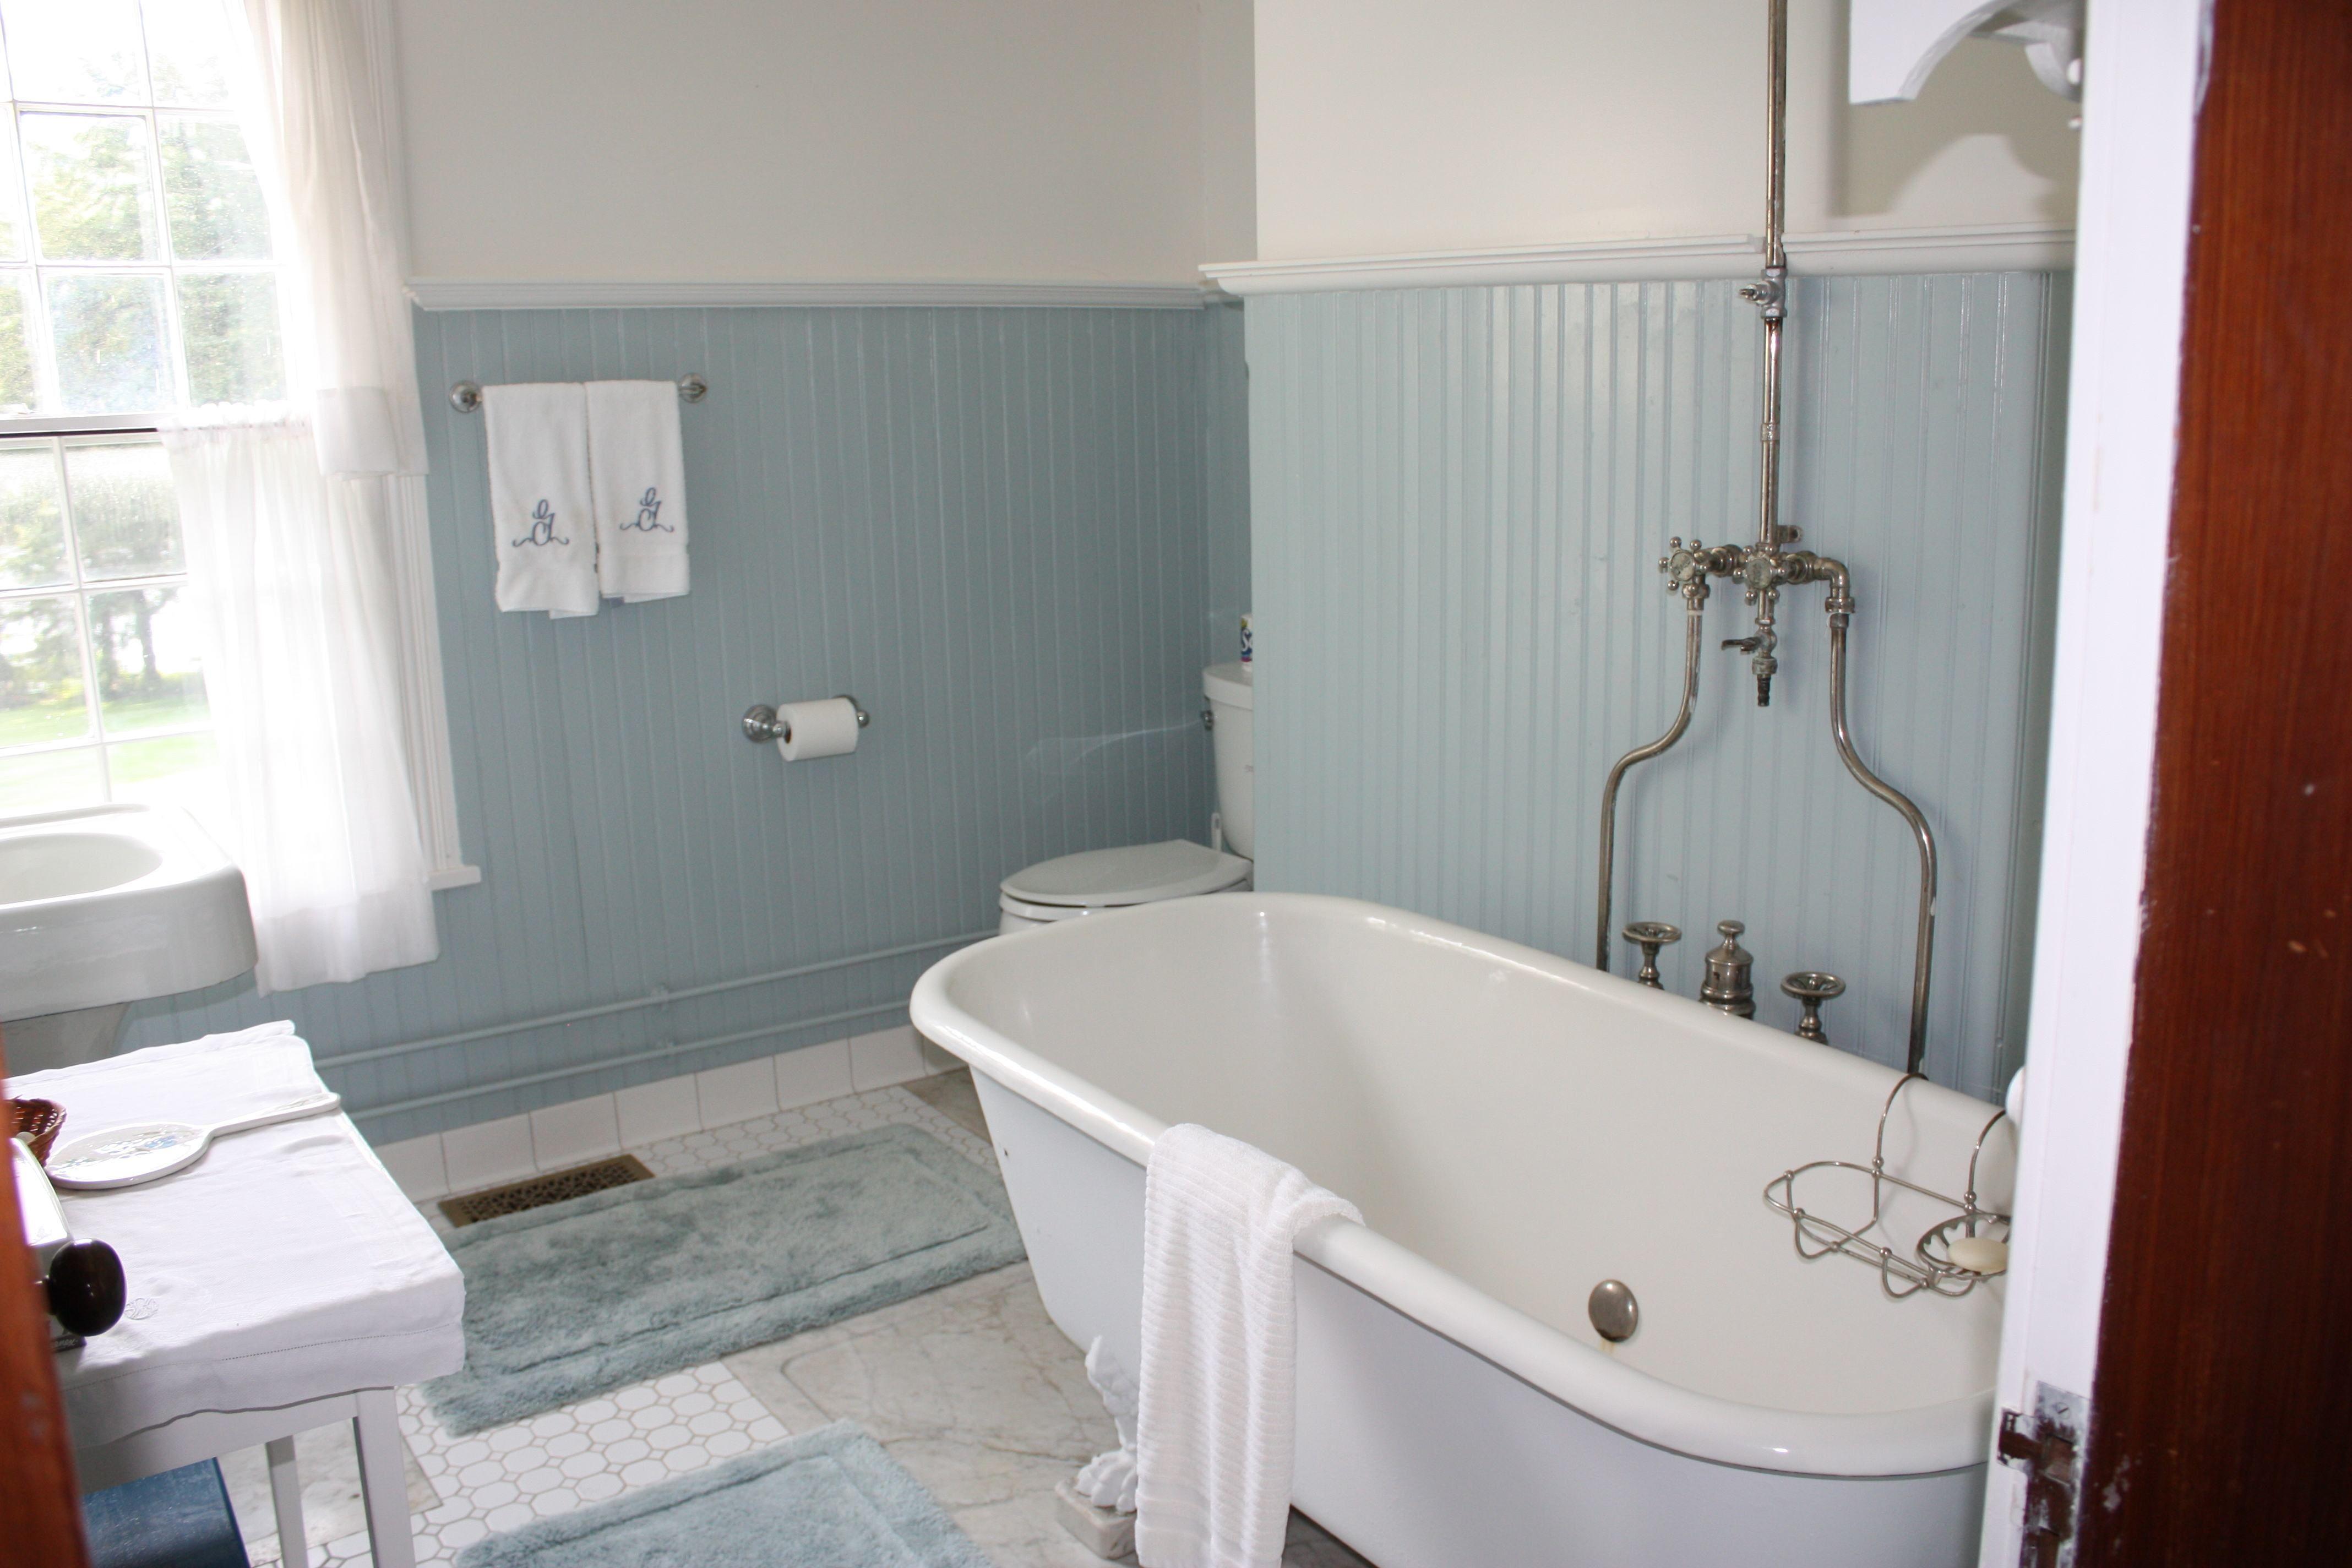 Old Blue Tiled Bathroom Decorating Ideas 2020 Goruntuler Ile